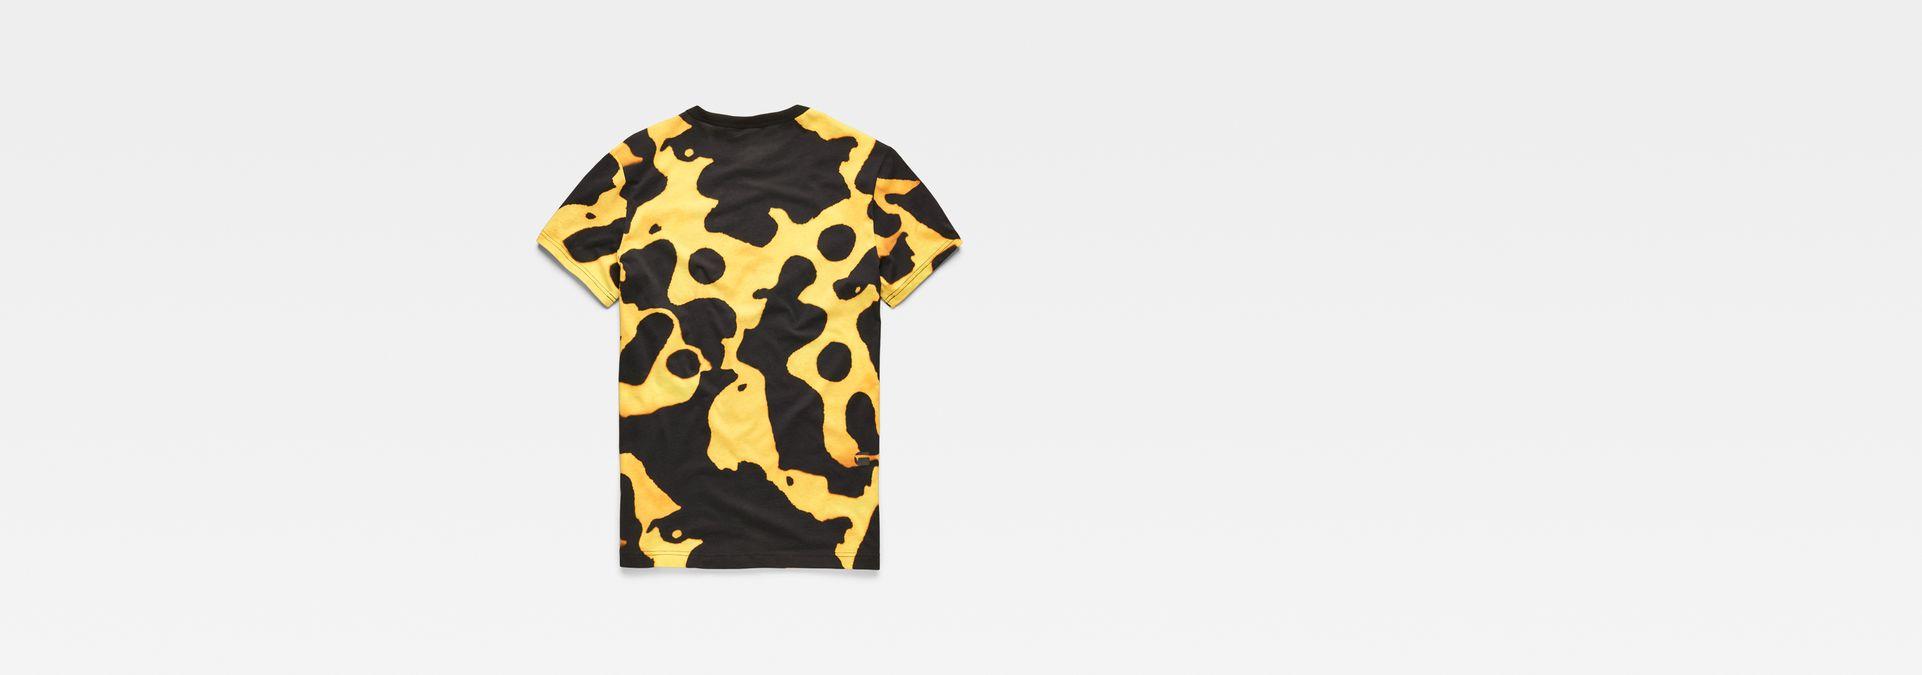 47628c953 ... G-Star RAW® Fian Bumble Frog Patterned T-Shirt Yellow flat back